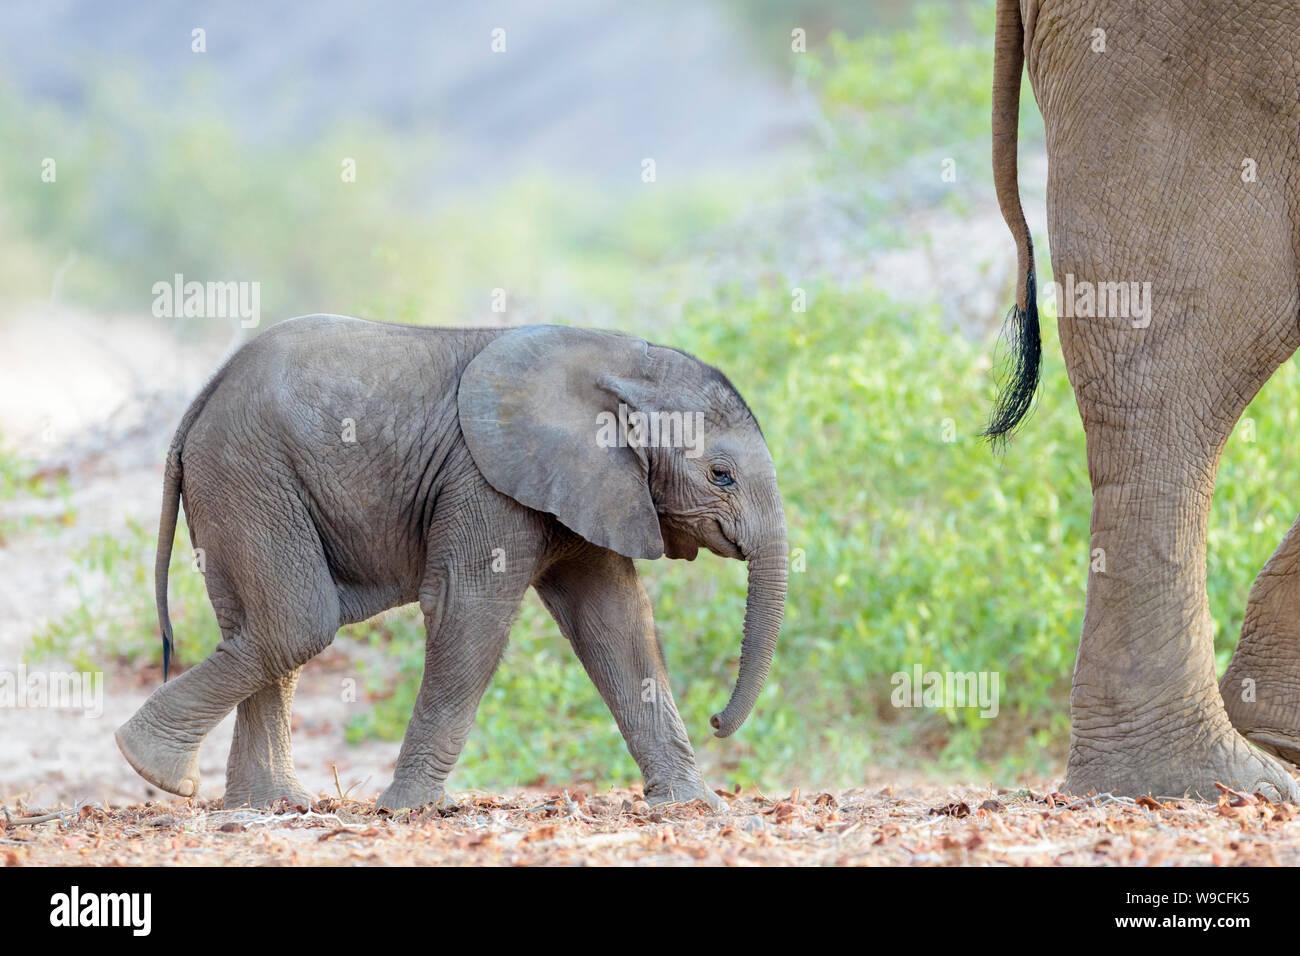 African Elephant (Loxodonta africana), desert-adapted elephant calf, walking behind mother in dry riverbed, Hoanib desert, Kaokoland, Namibia. Stock Photo